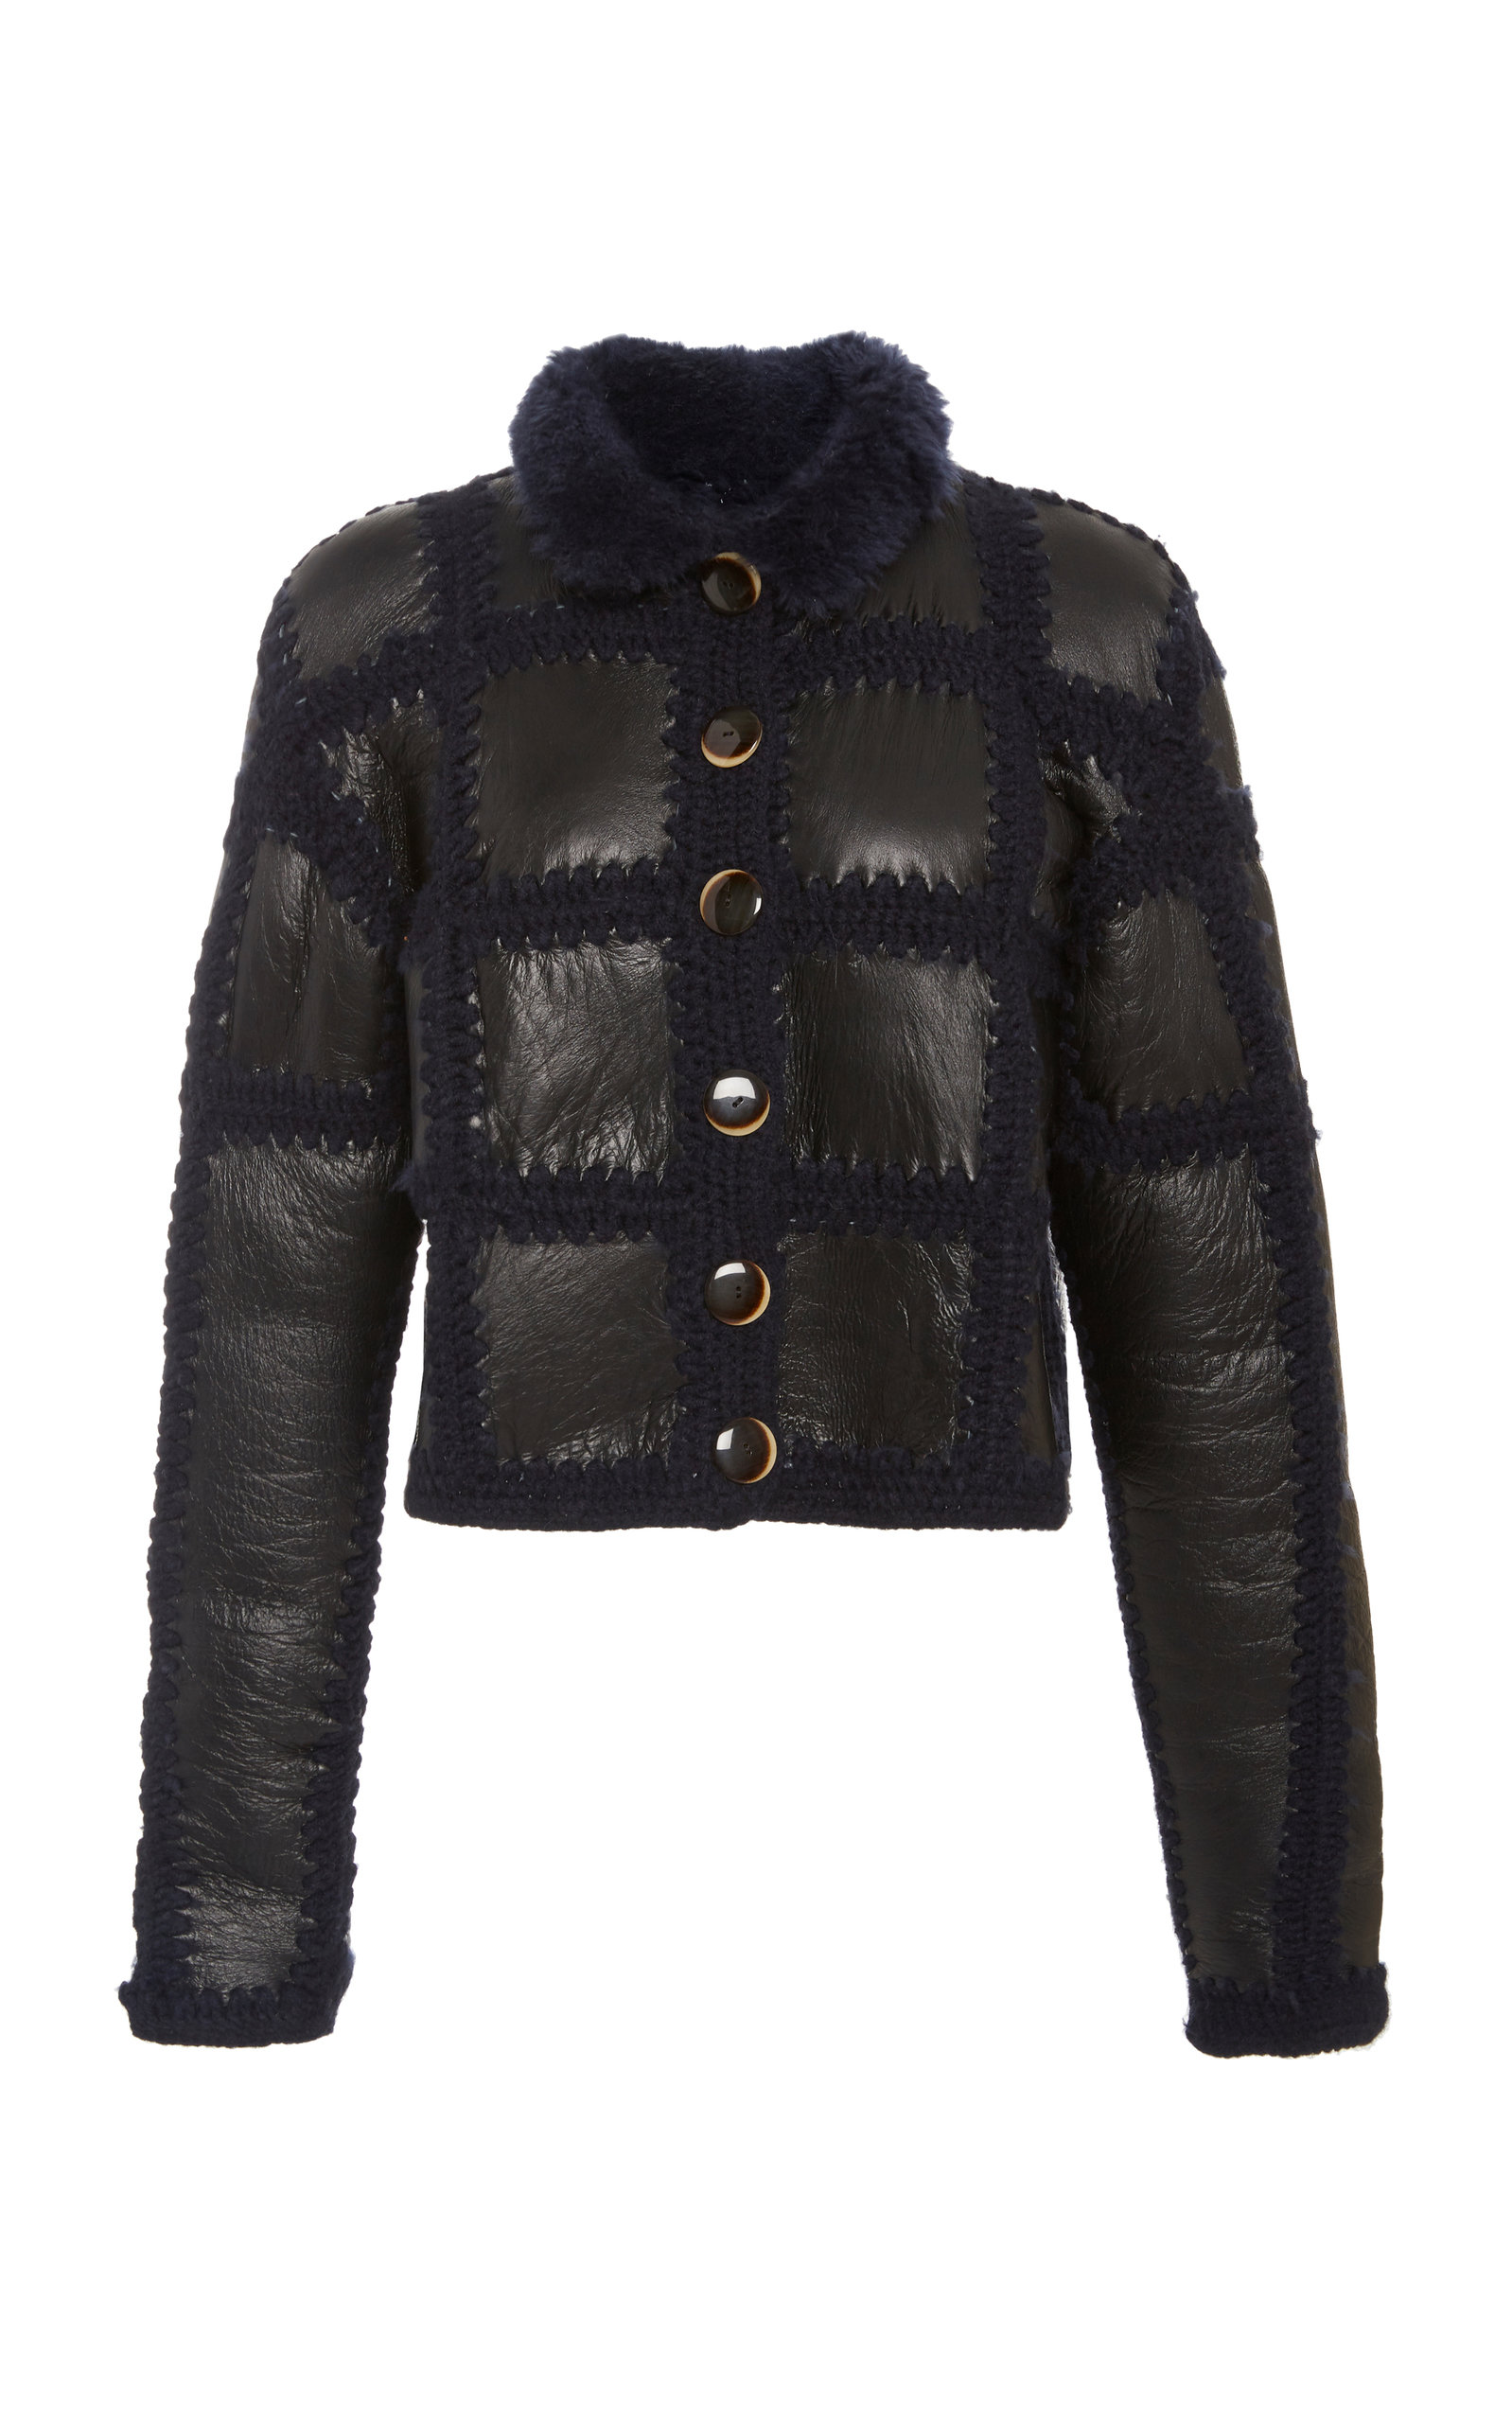 106e774baae4 Shop Ulla Johnson Elia Shearling Cropped Jacket In Navy